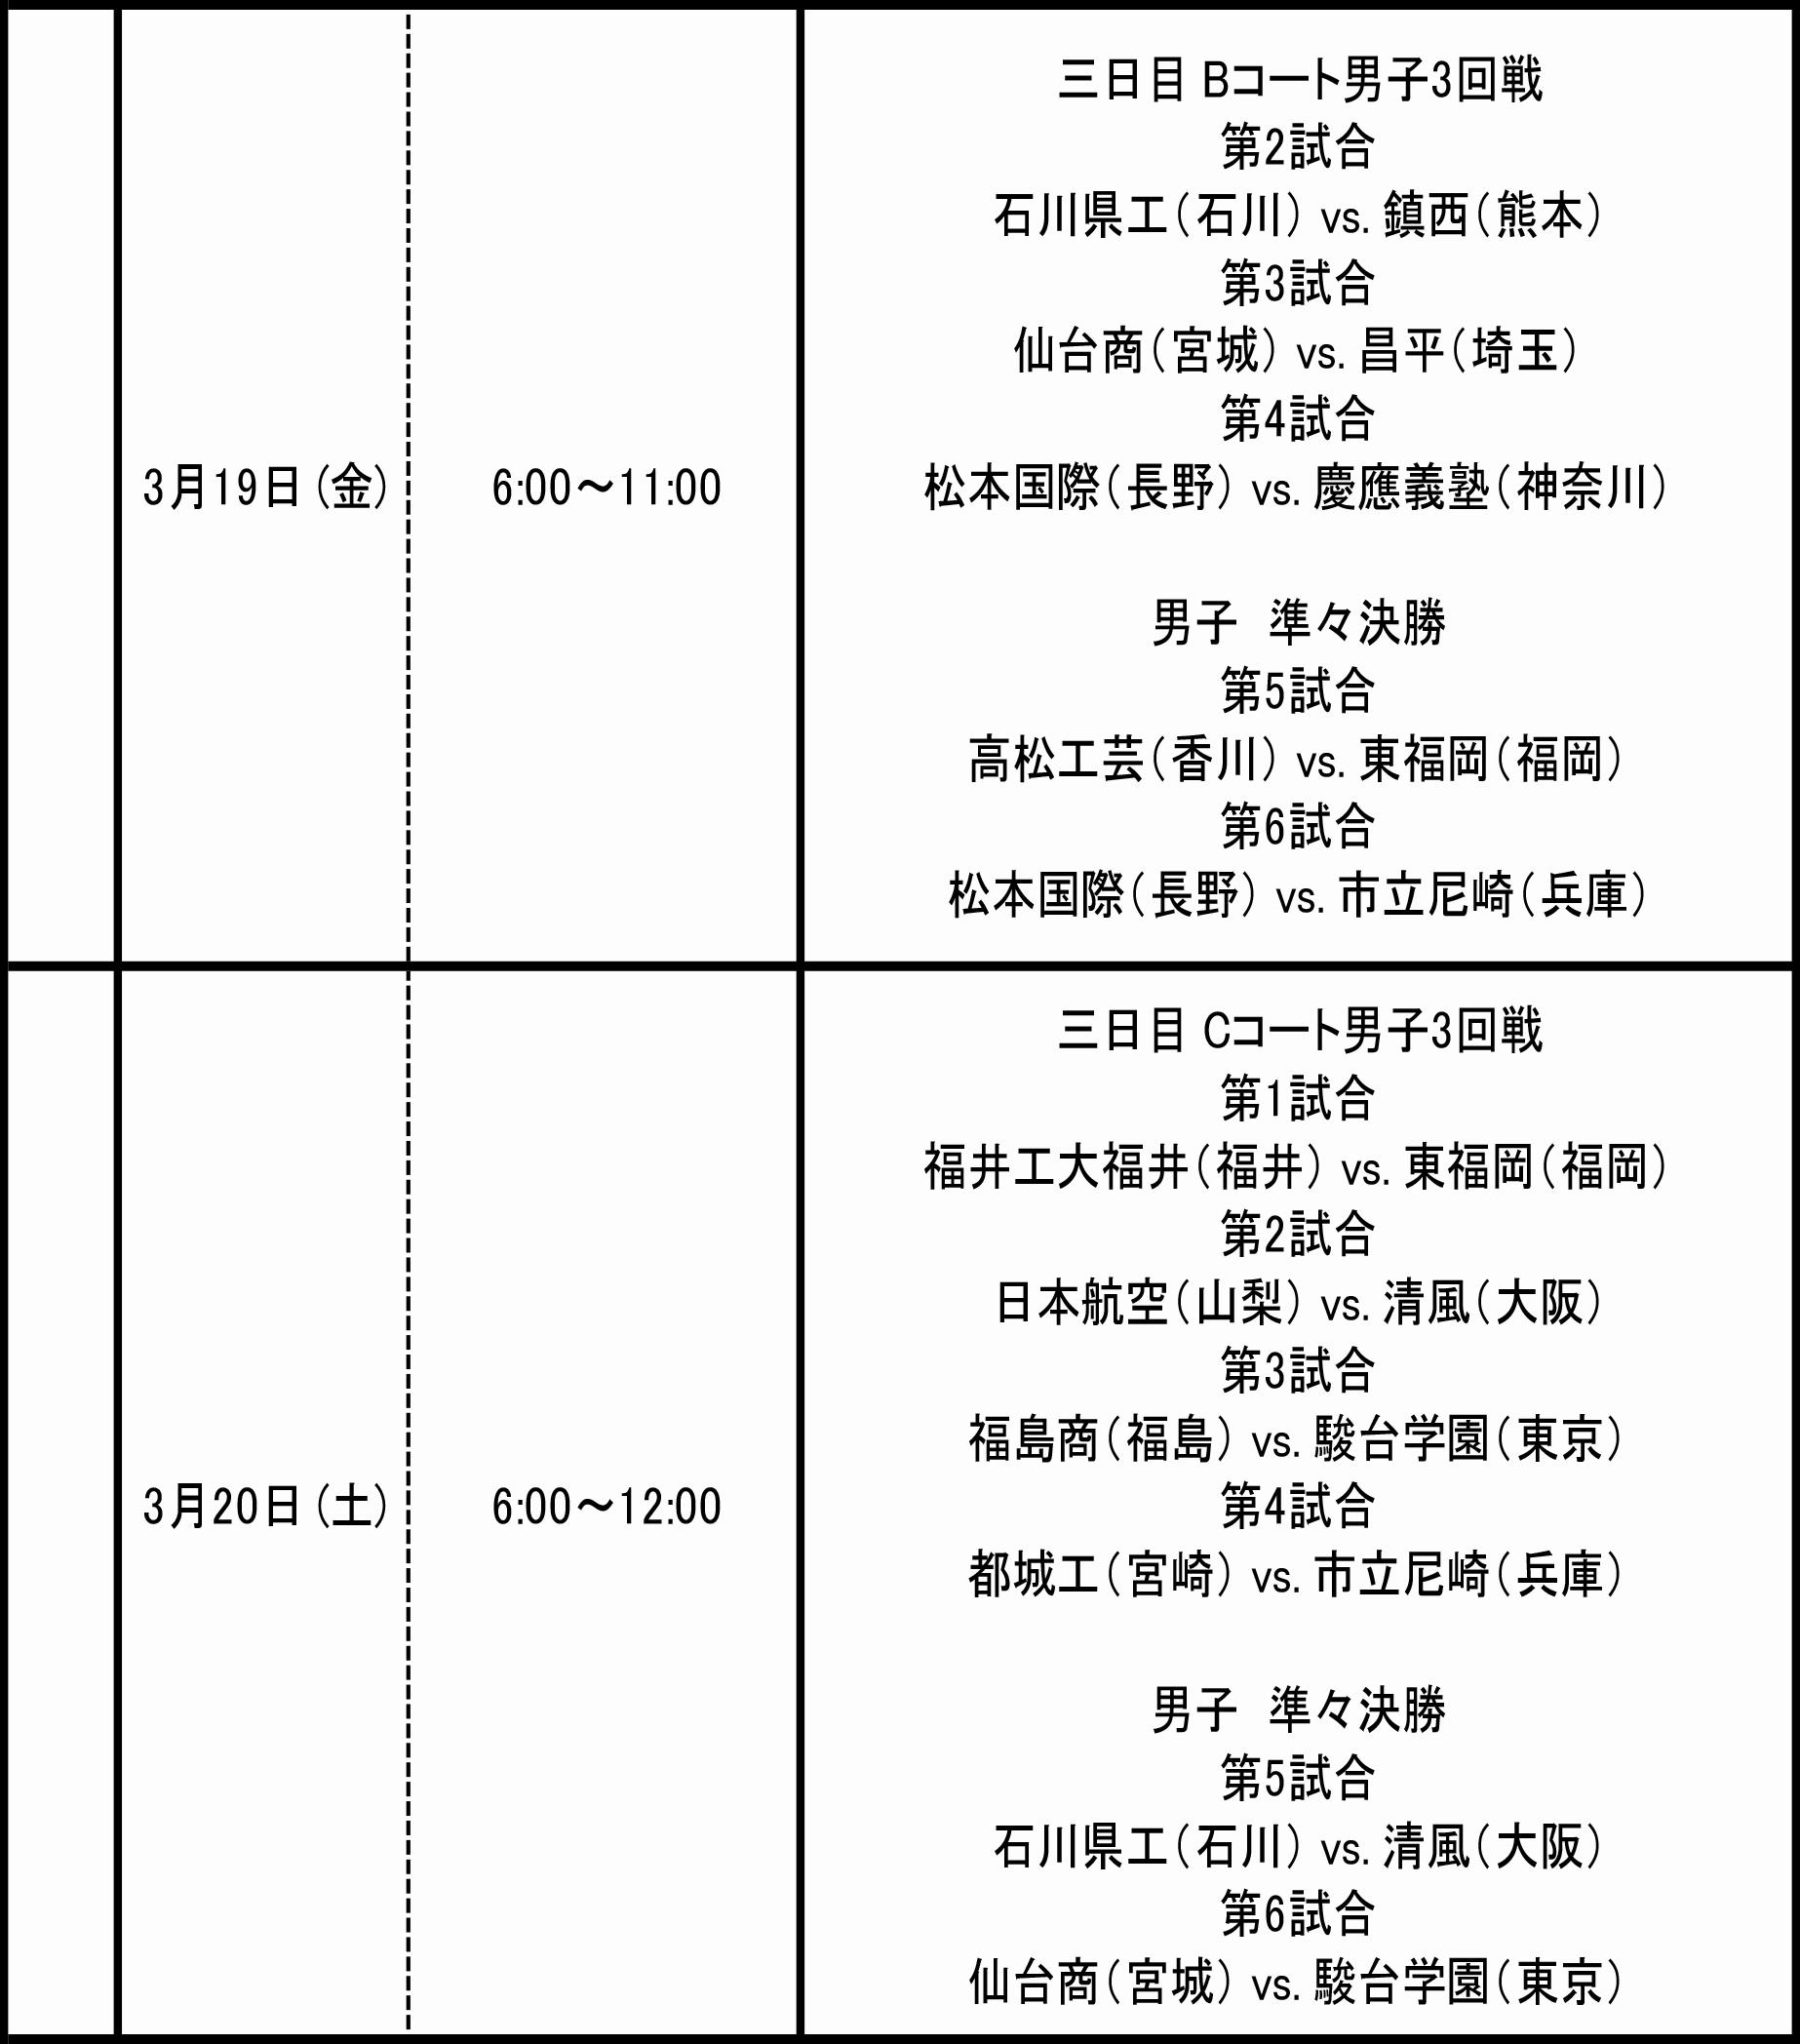 テレビ 番組 表 兵庫